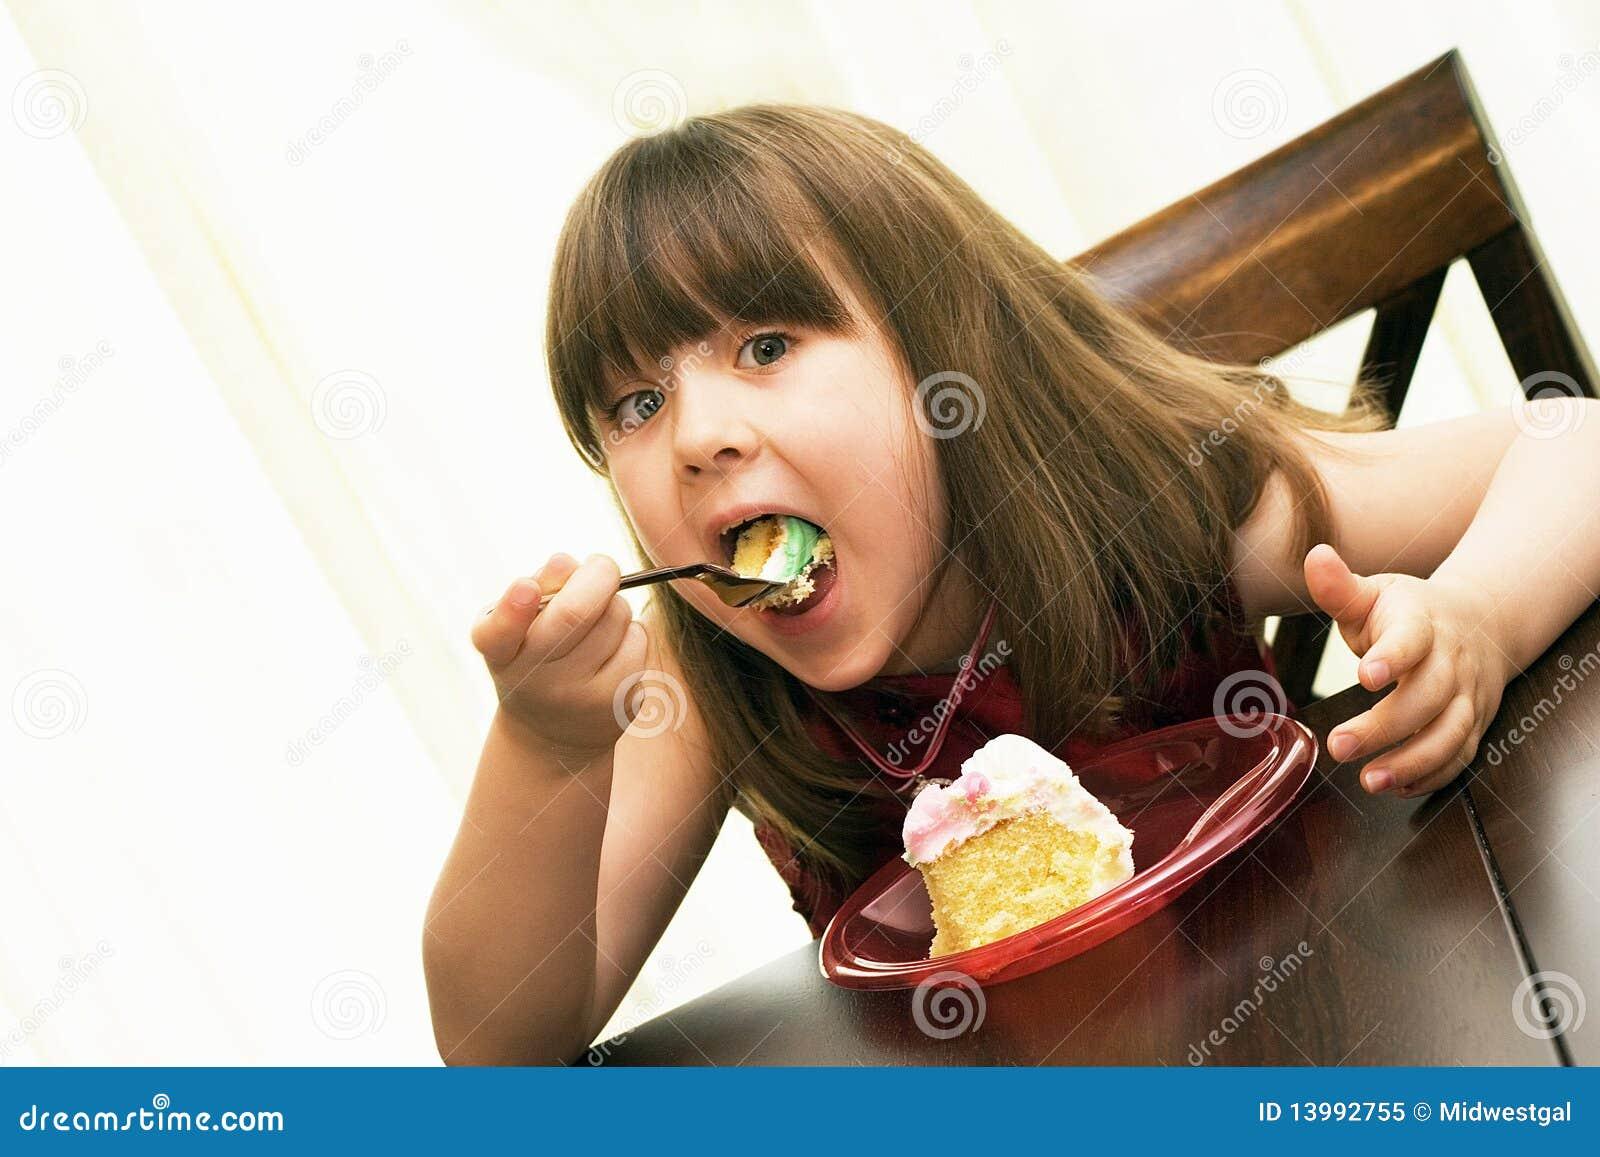 Child eating birthday